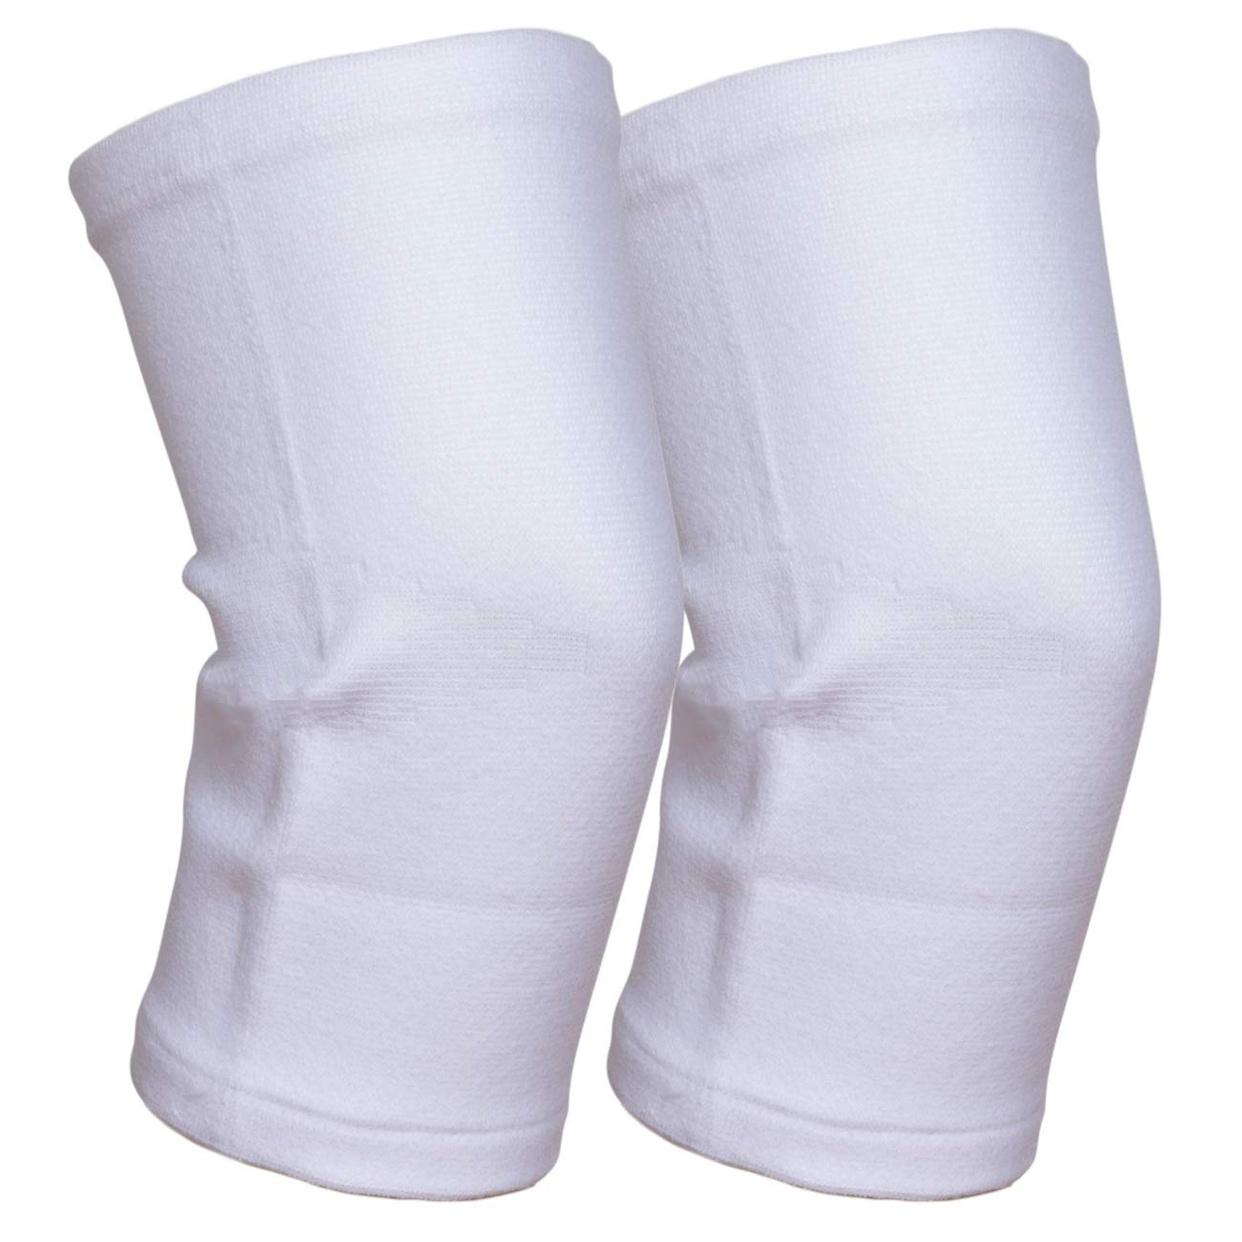 TOMOZONE(トモゾーン) 膝サポーター 両ヒザ用の商品画像